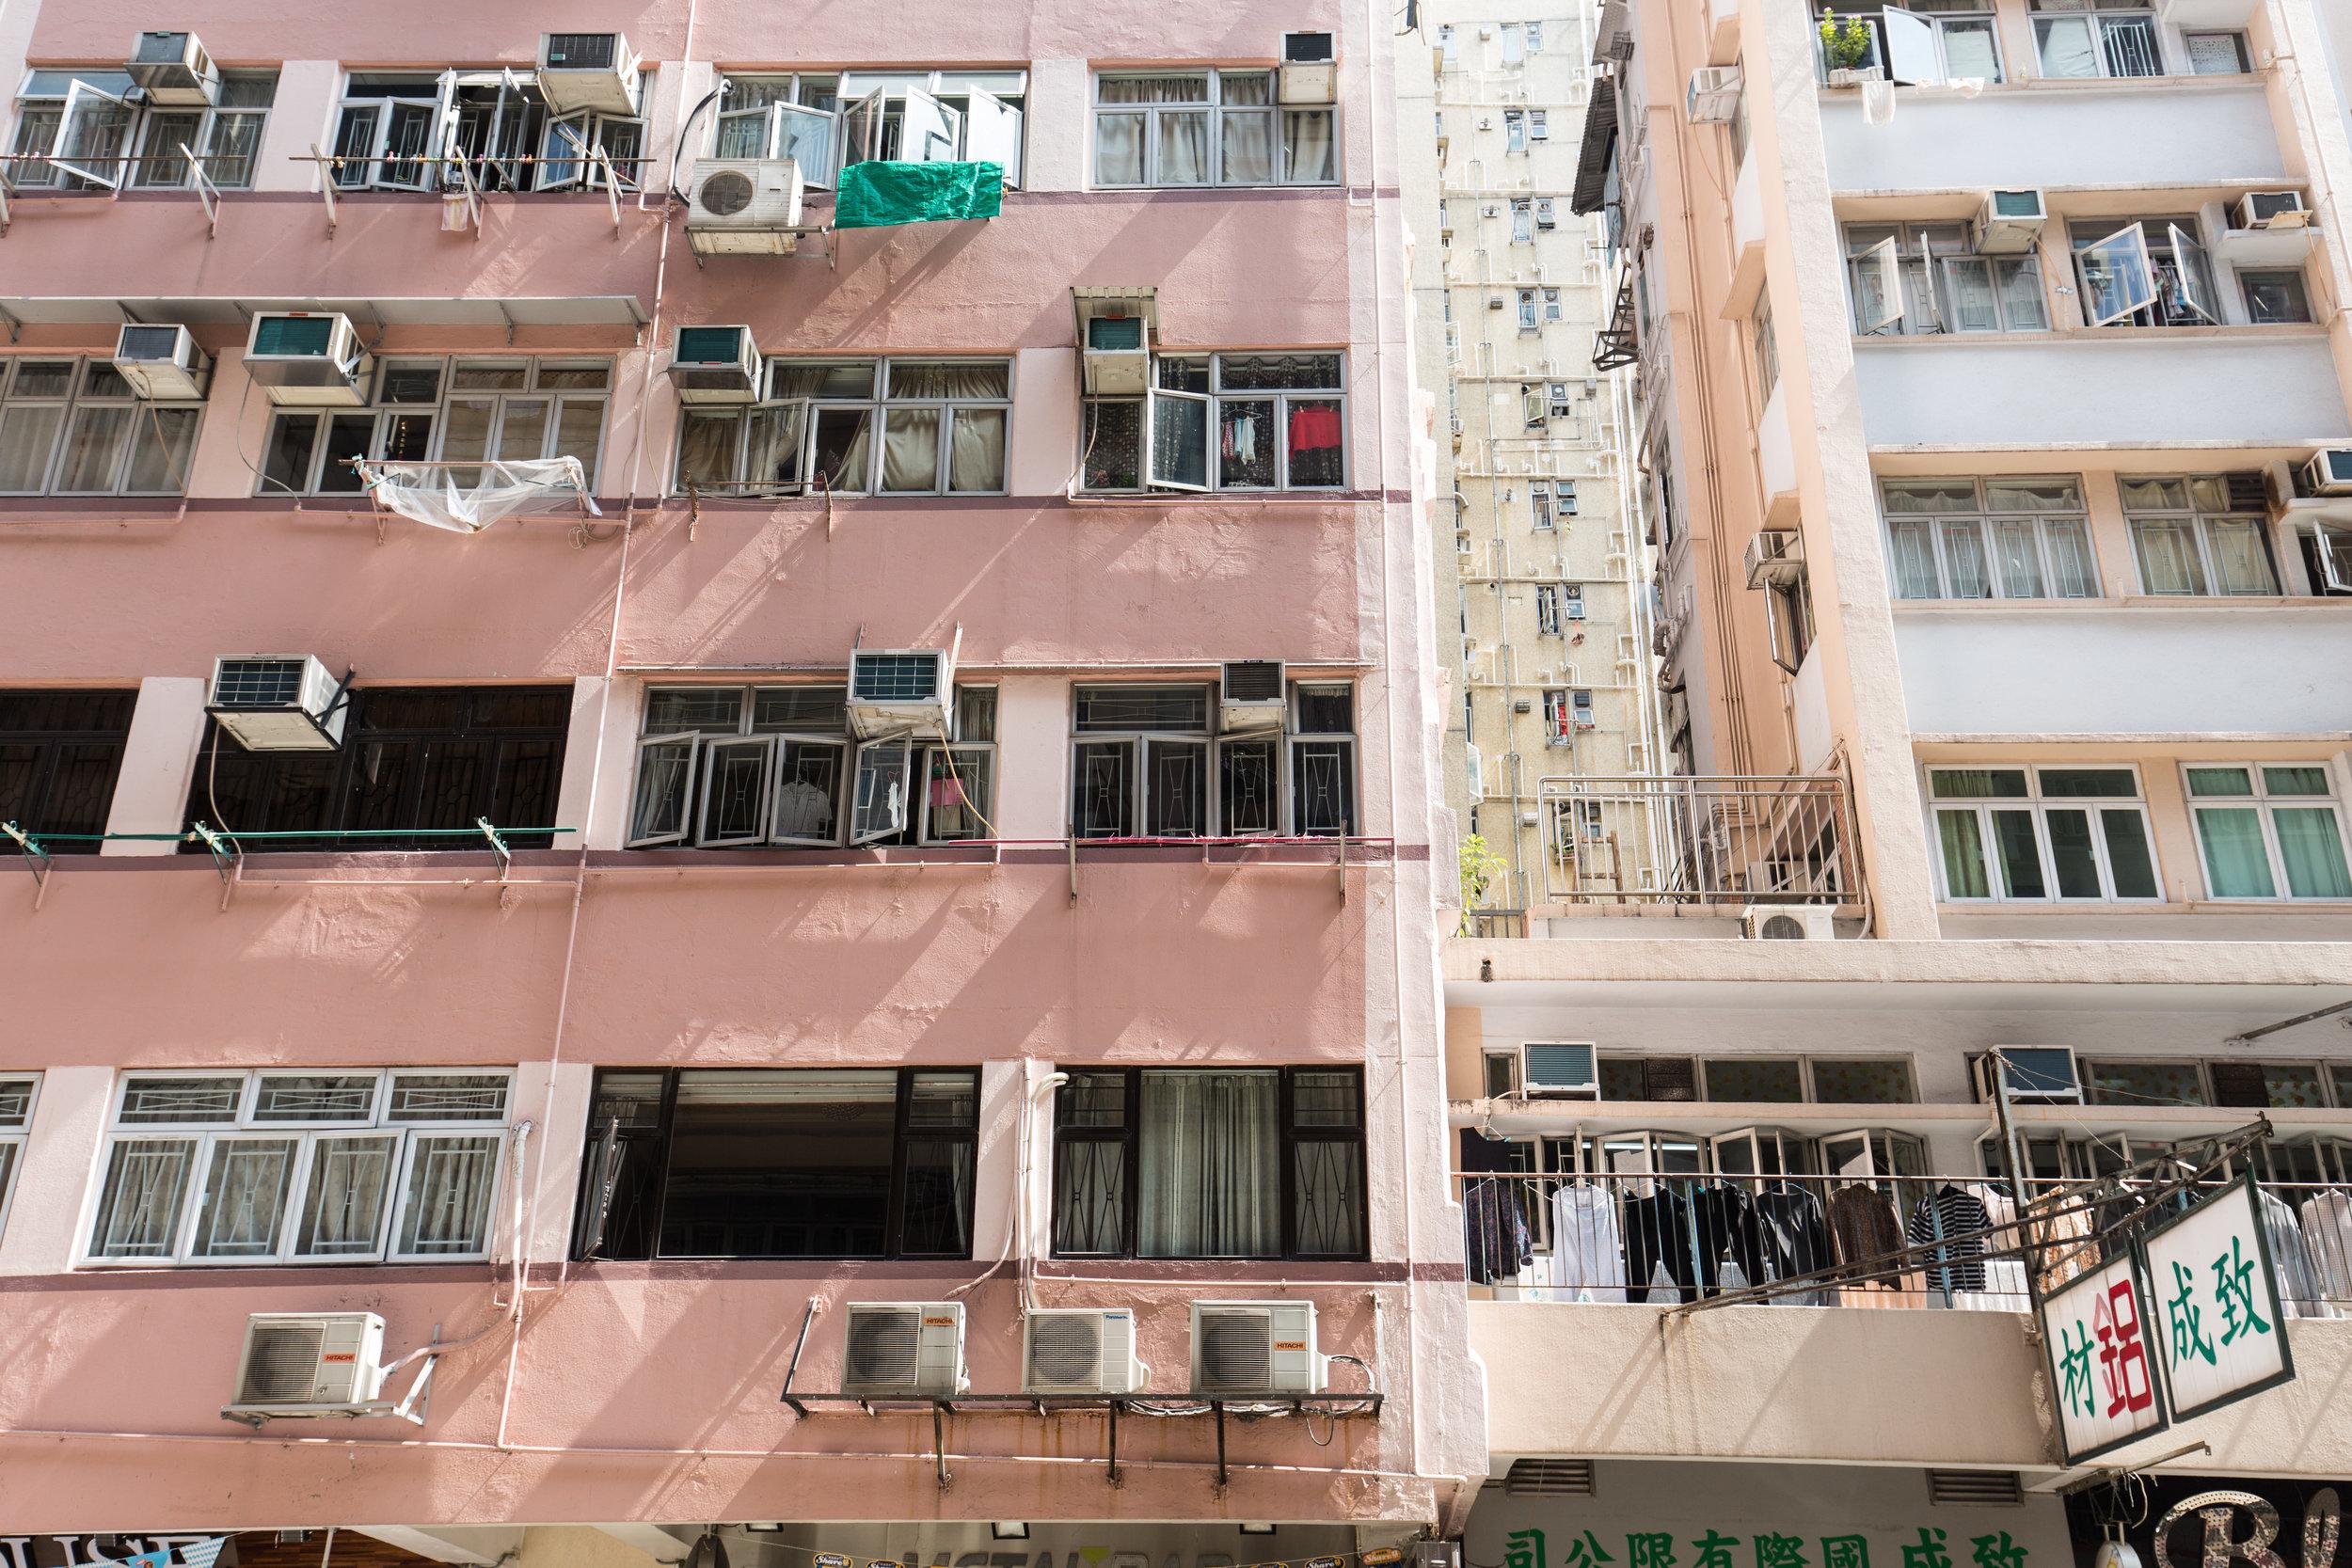 Residencial building above Fa Yuen Street in Mong Kok Hong Kong